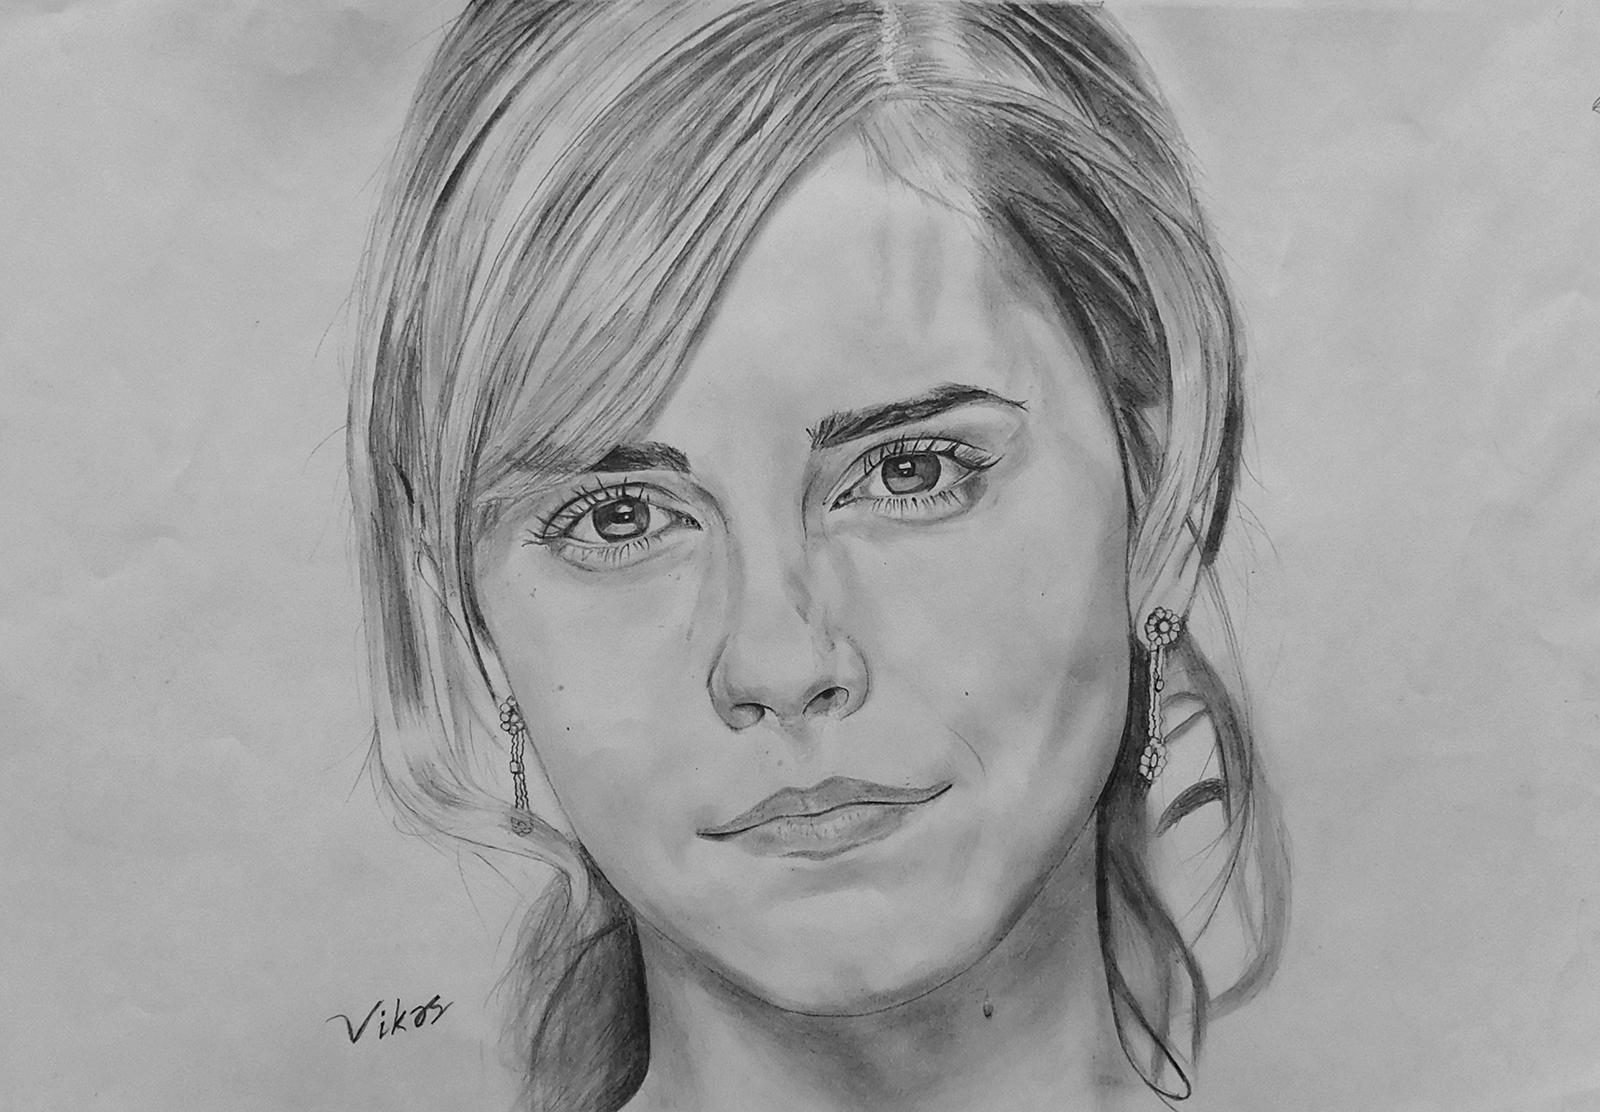 Sourcewing pencil drawing of emma watson